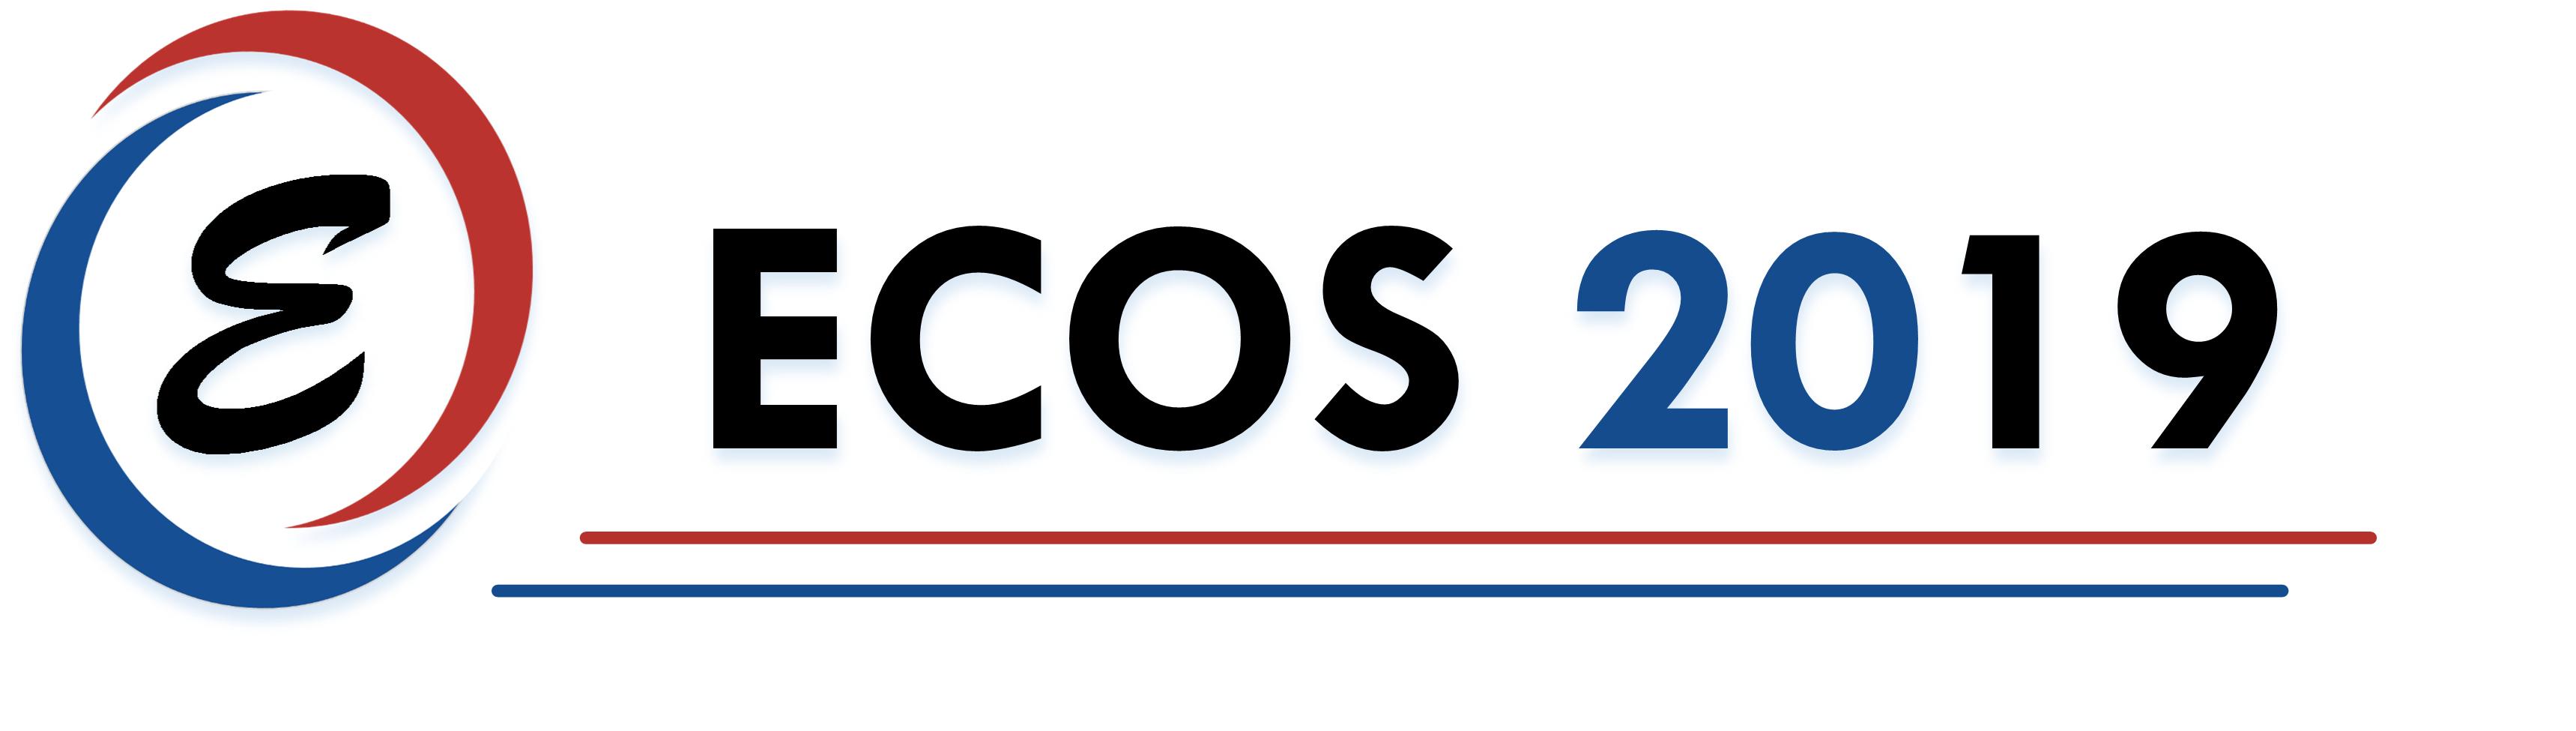 ECOS 2019 logo